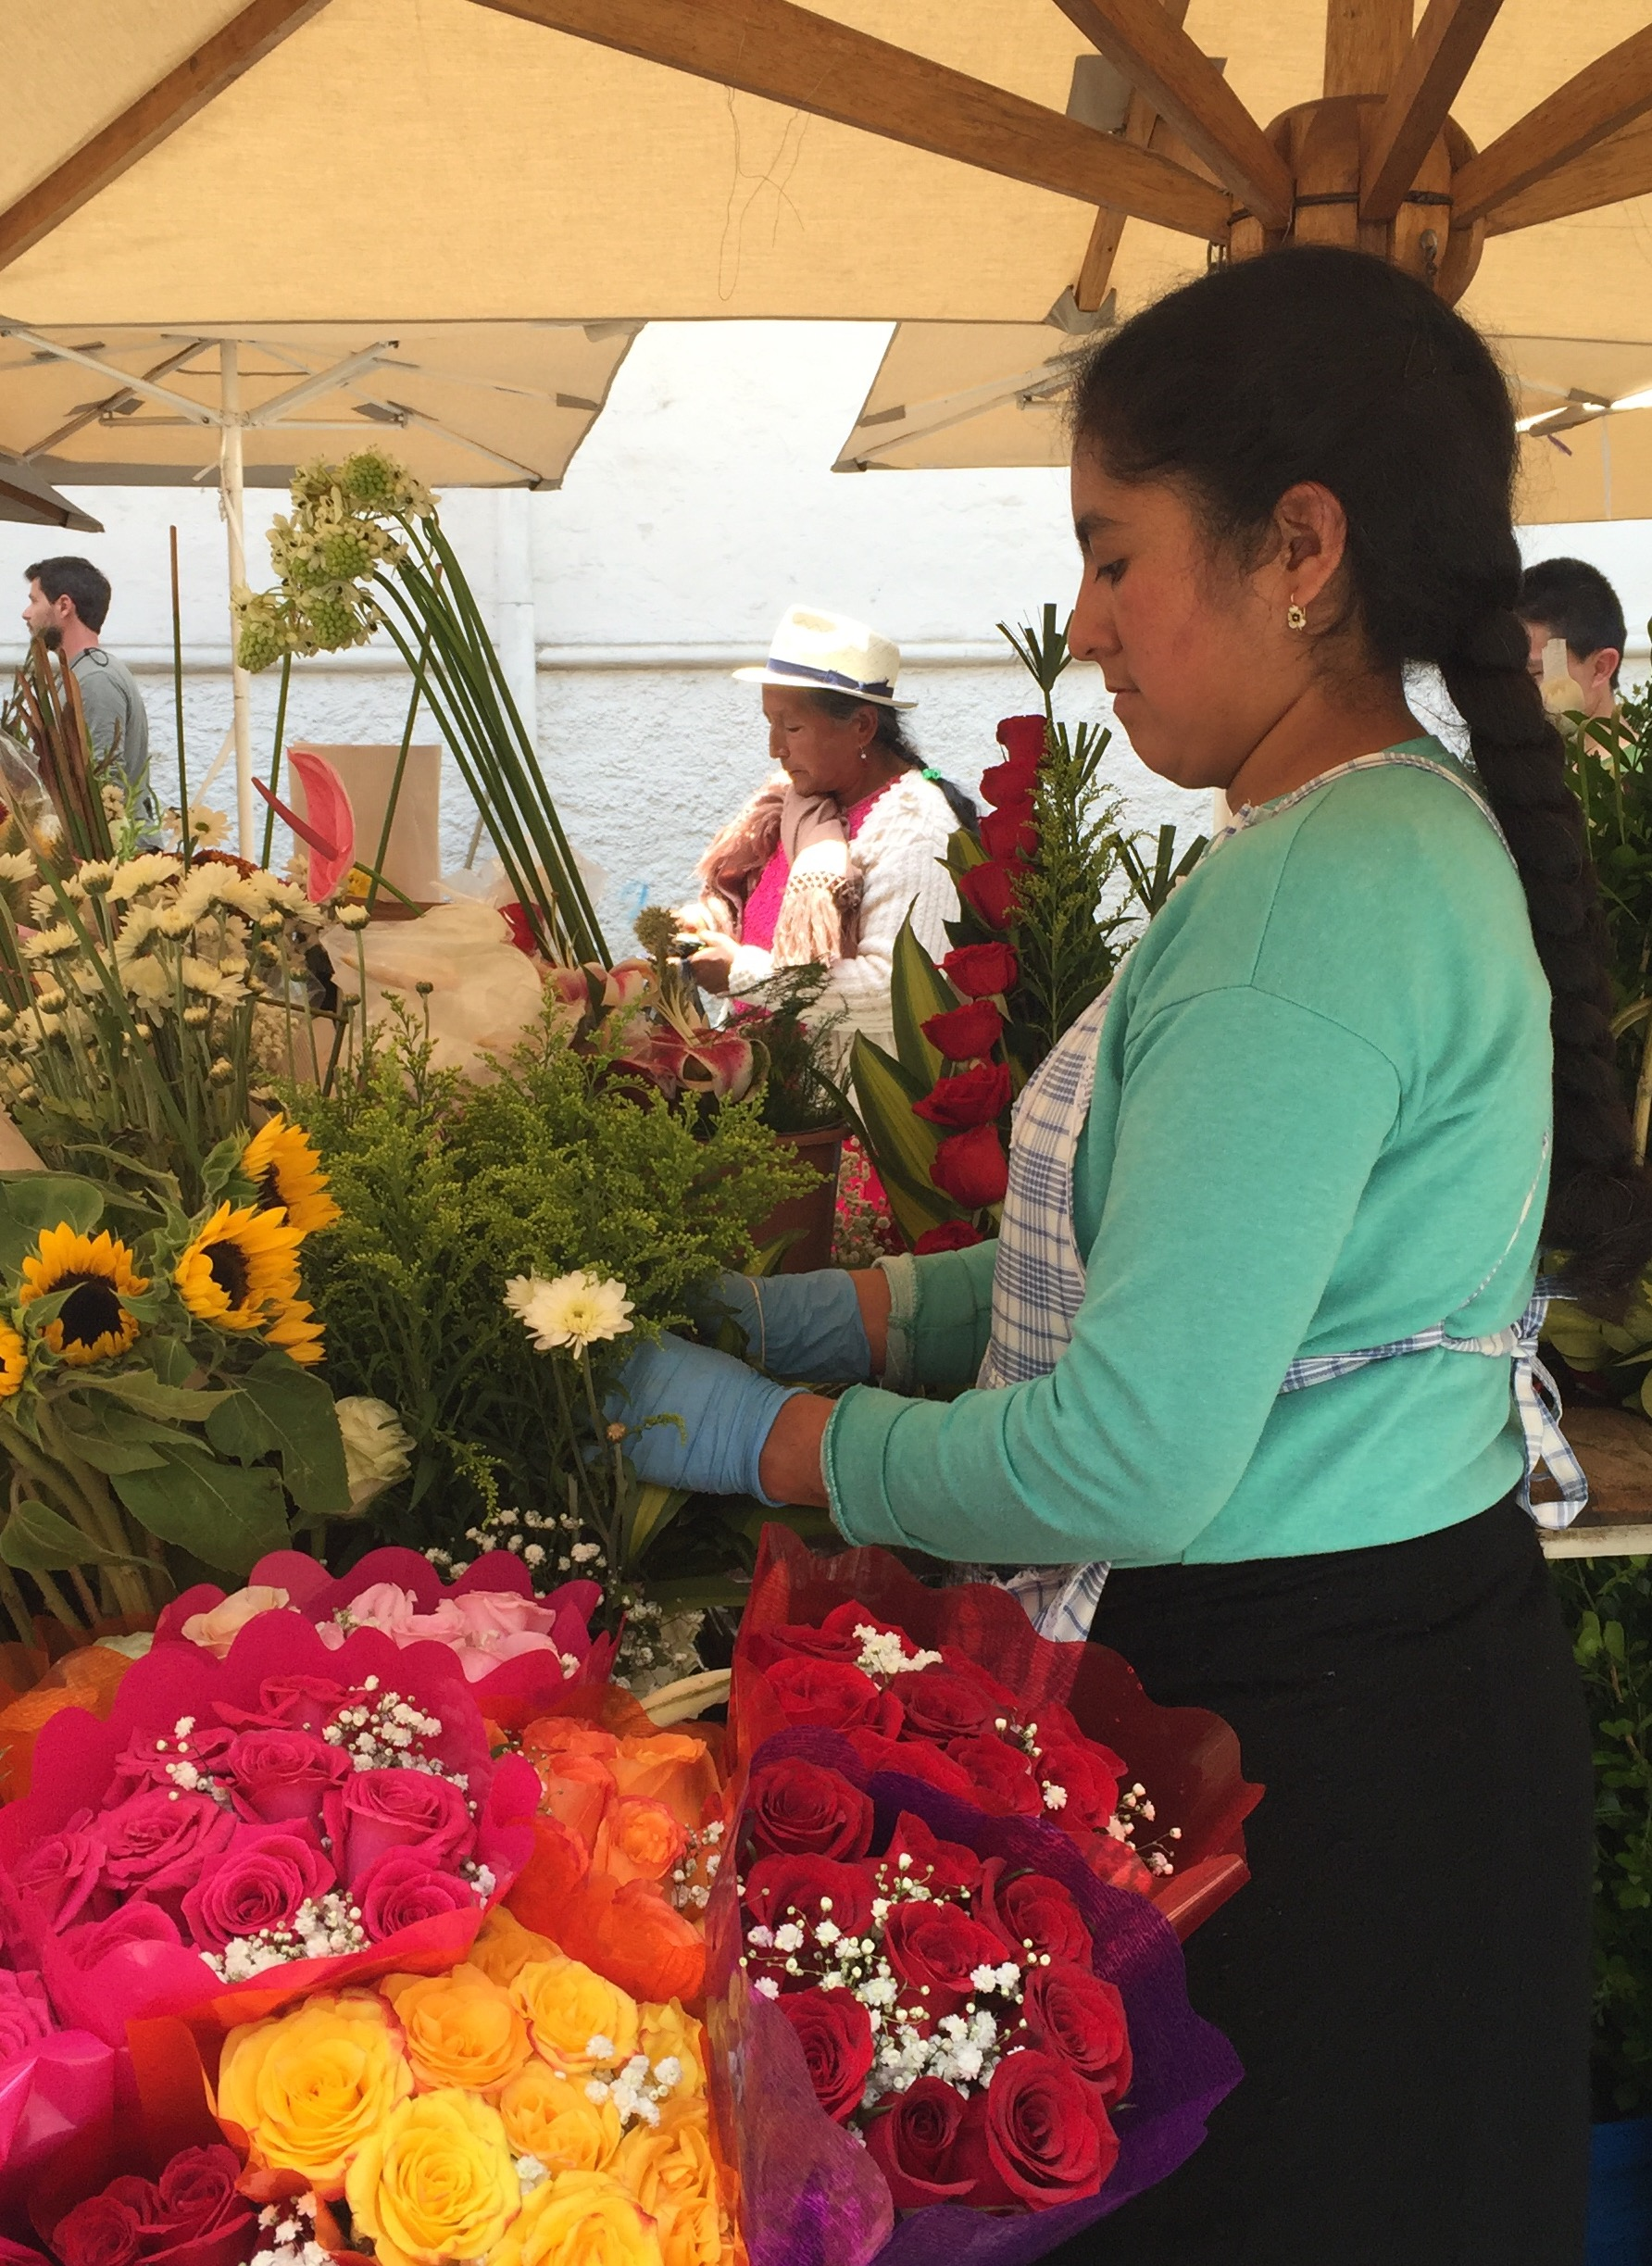 A flower vendor at work in Cuenca's flower market.